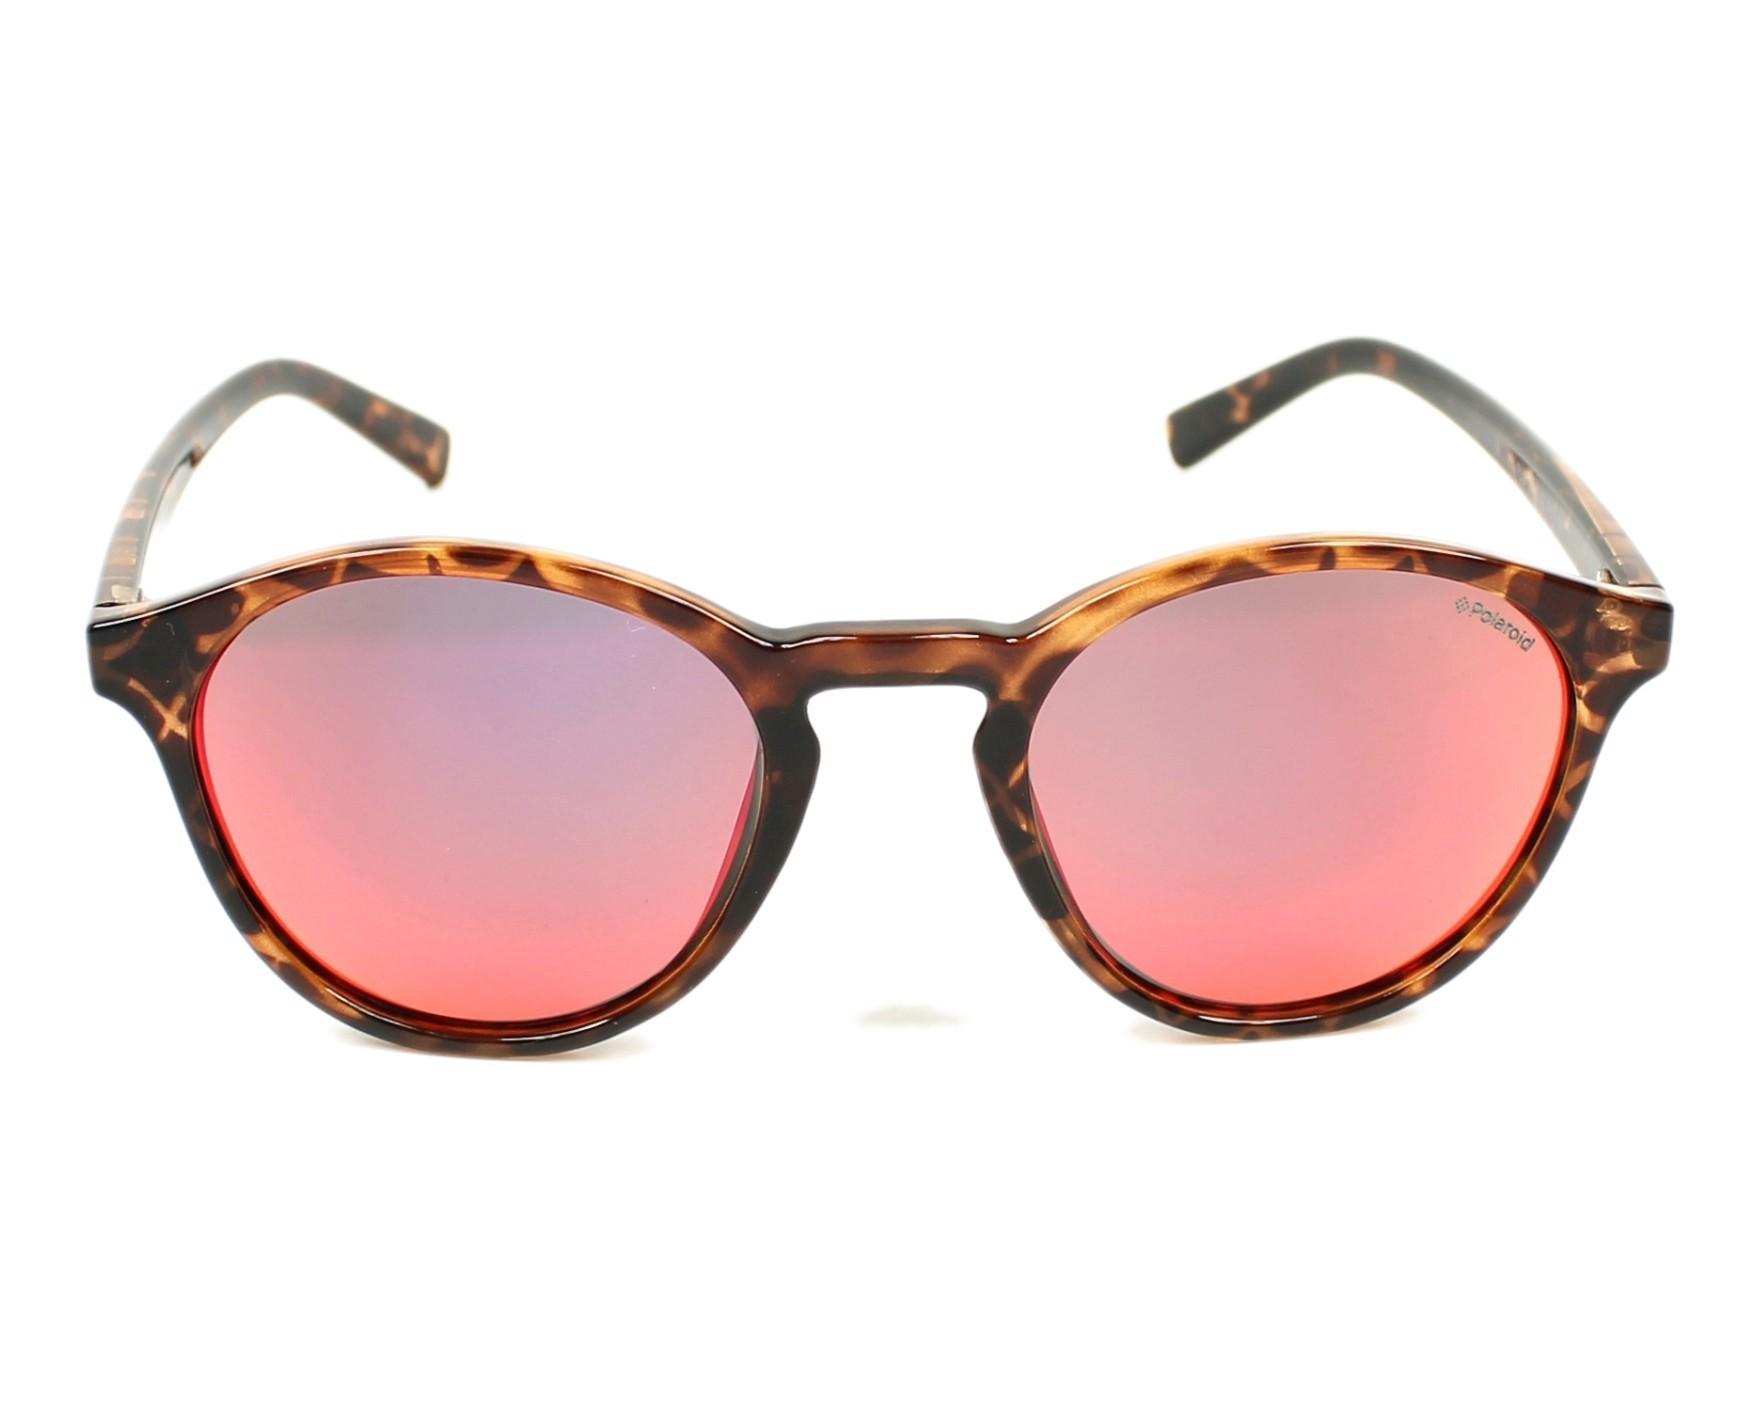 397761191d7 Sunglasses Polaroid PLD-6013-S PPT OZ 50-22 Havana front view